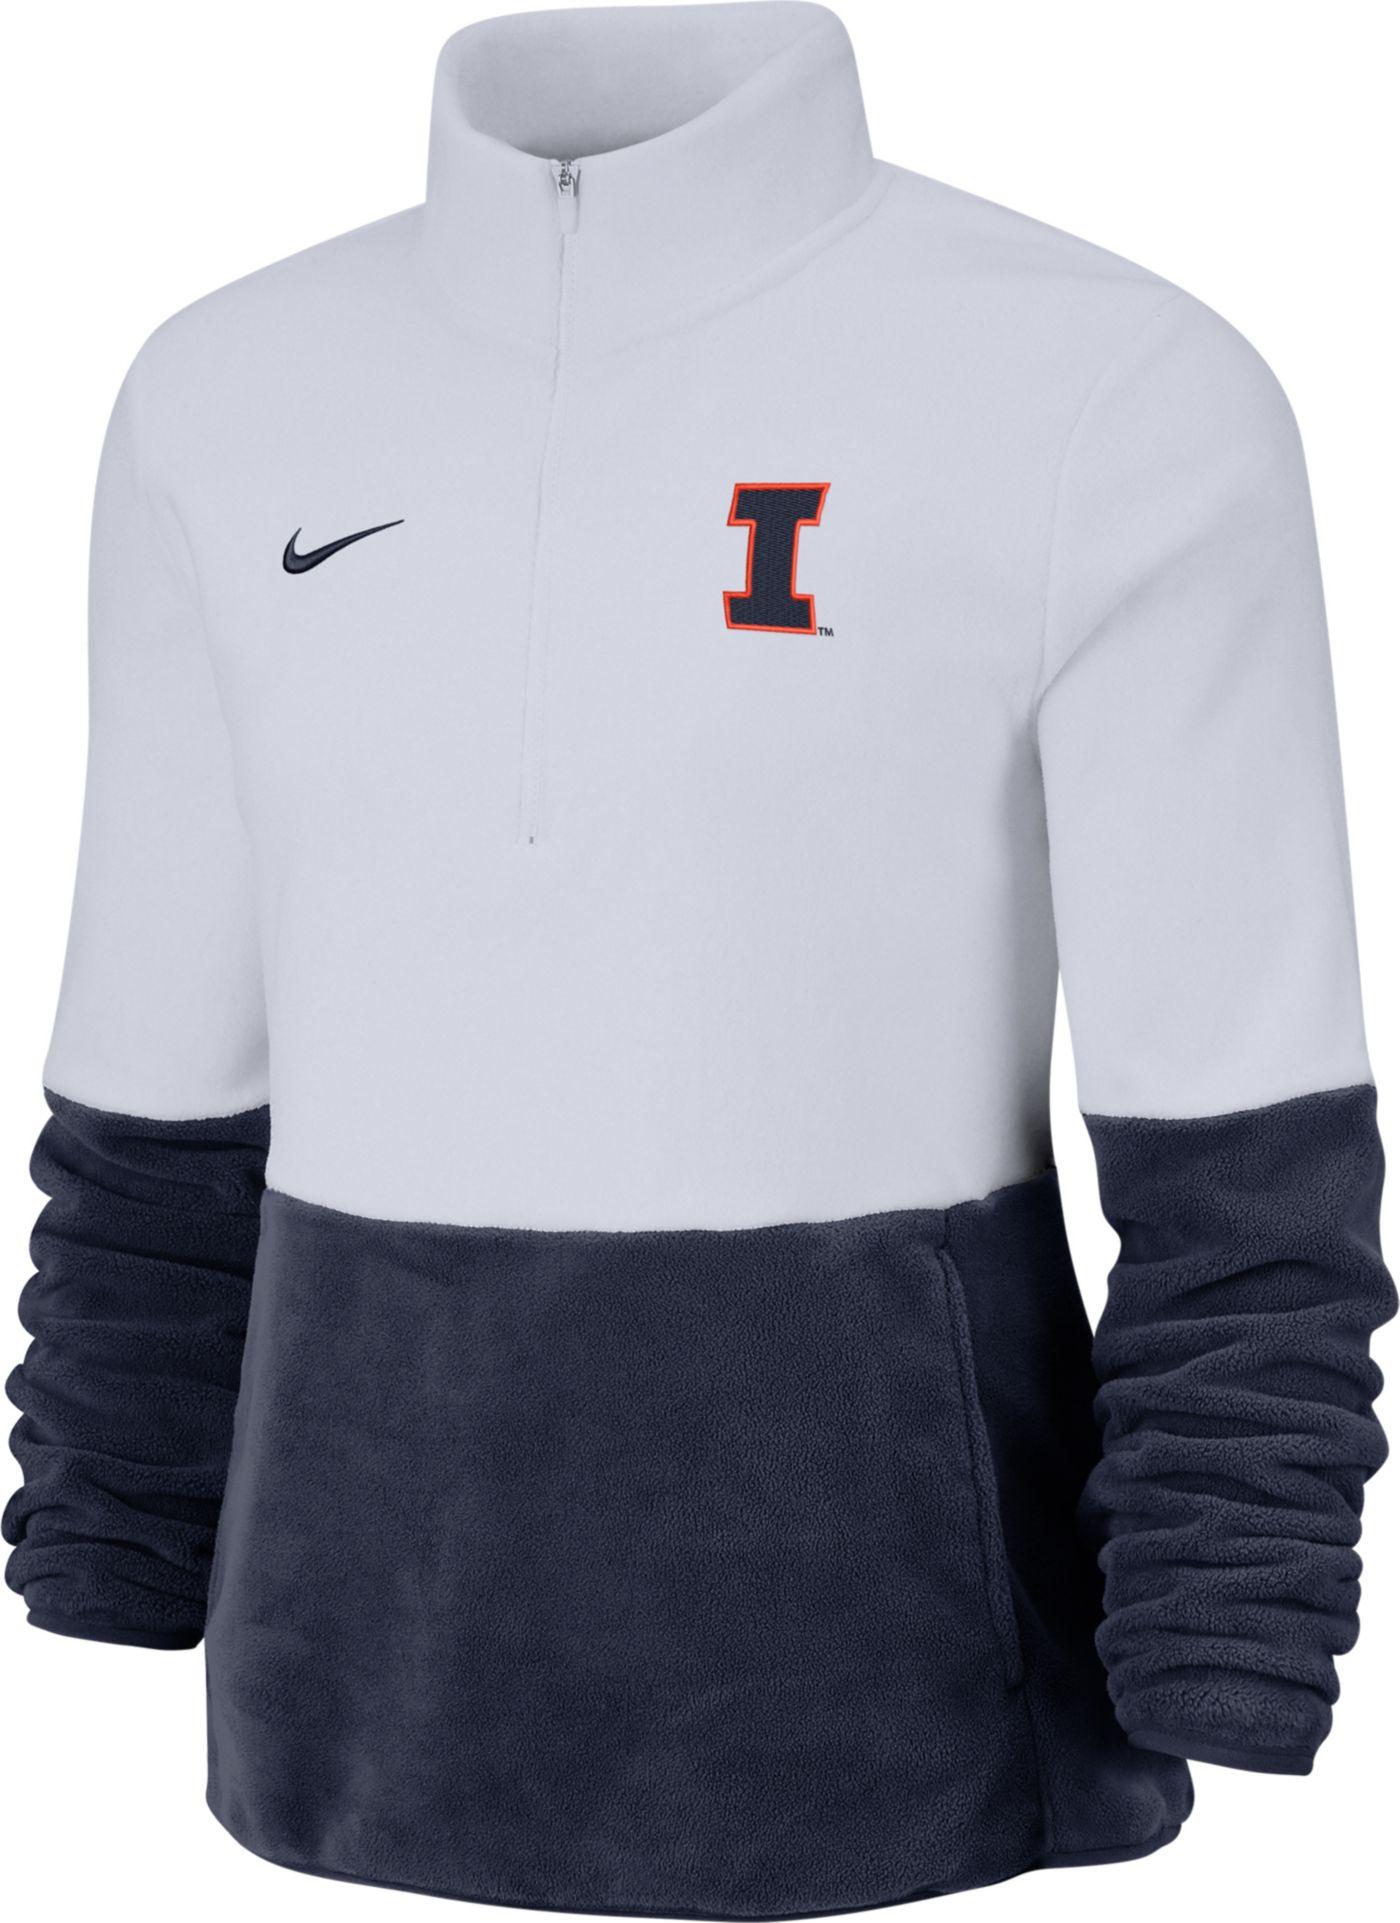 Nike Women's Illinois Fighting Illini Cozy Therma White Half-Zip Fleece